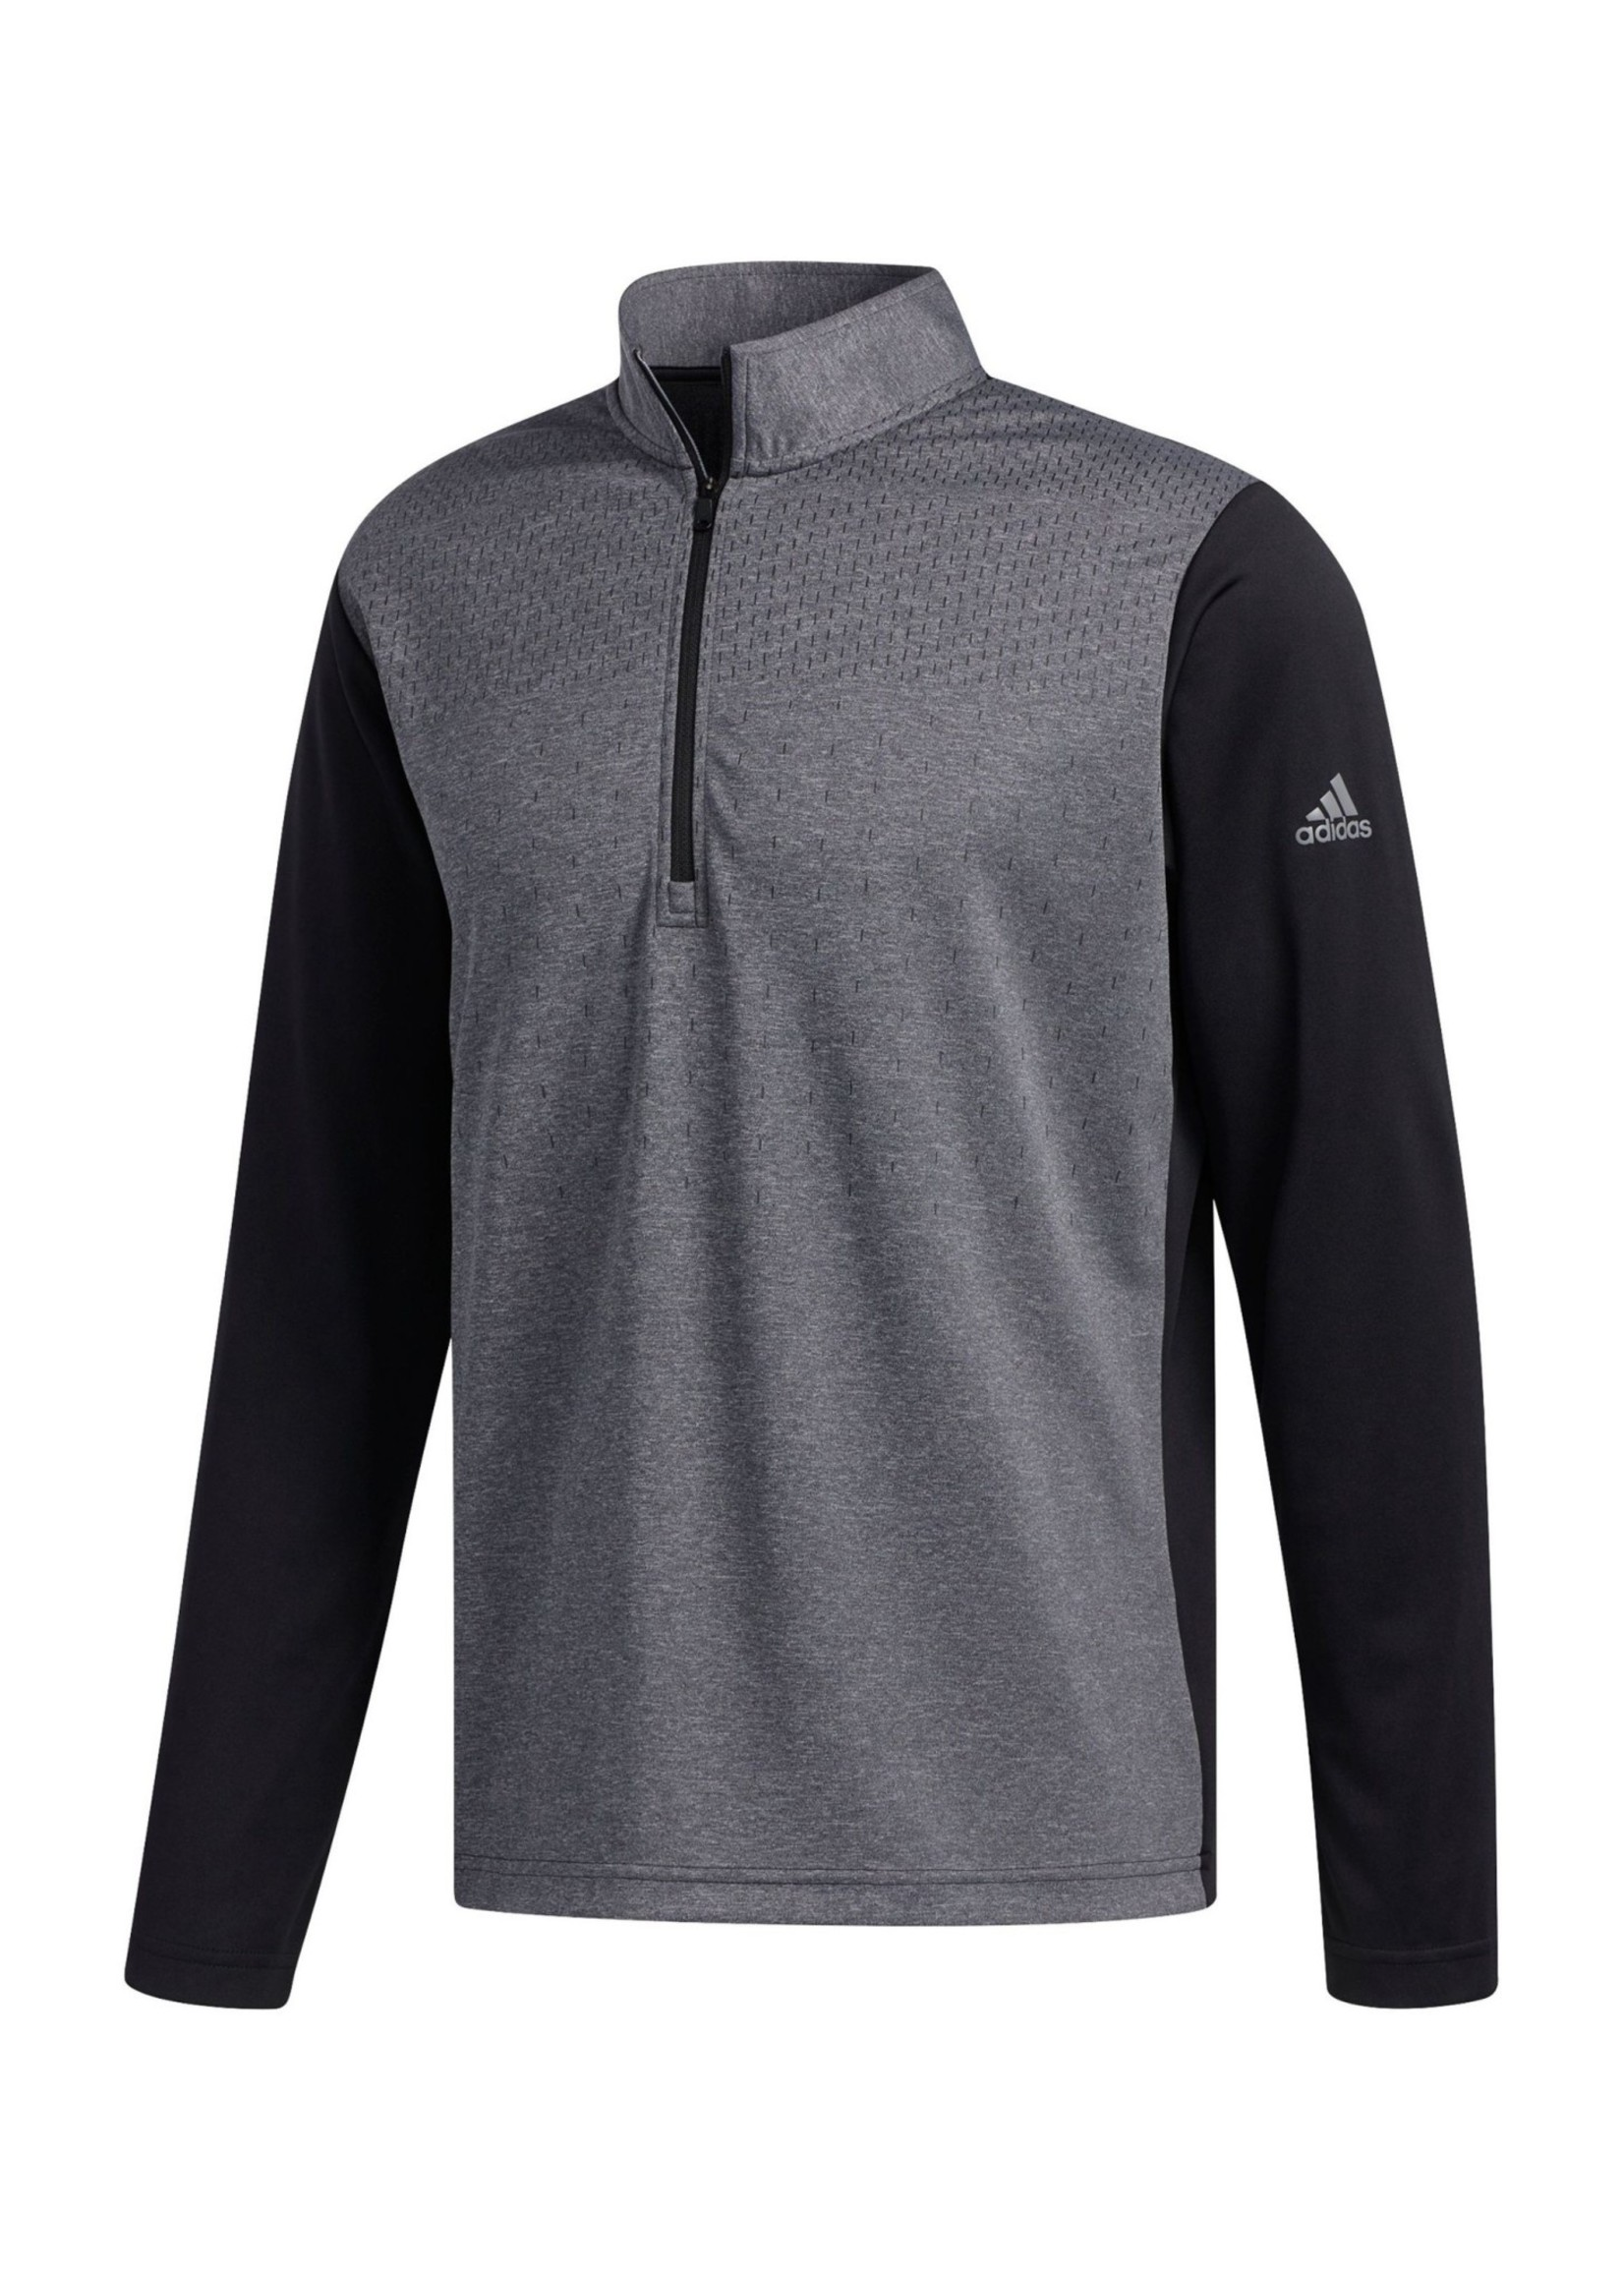 Adidas Adidas Performance Lightweight 1/4 Zip Top (2020)